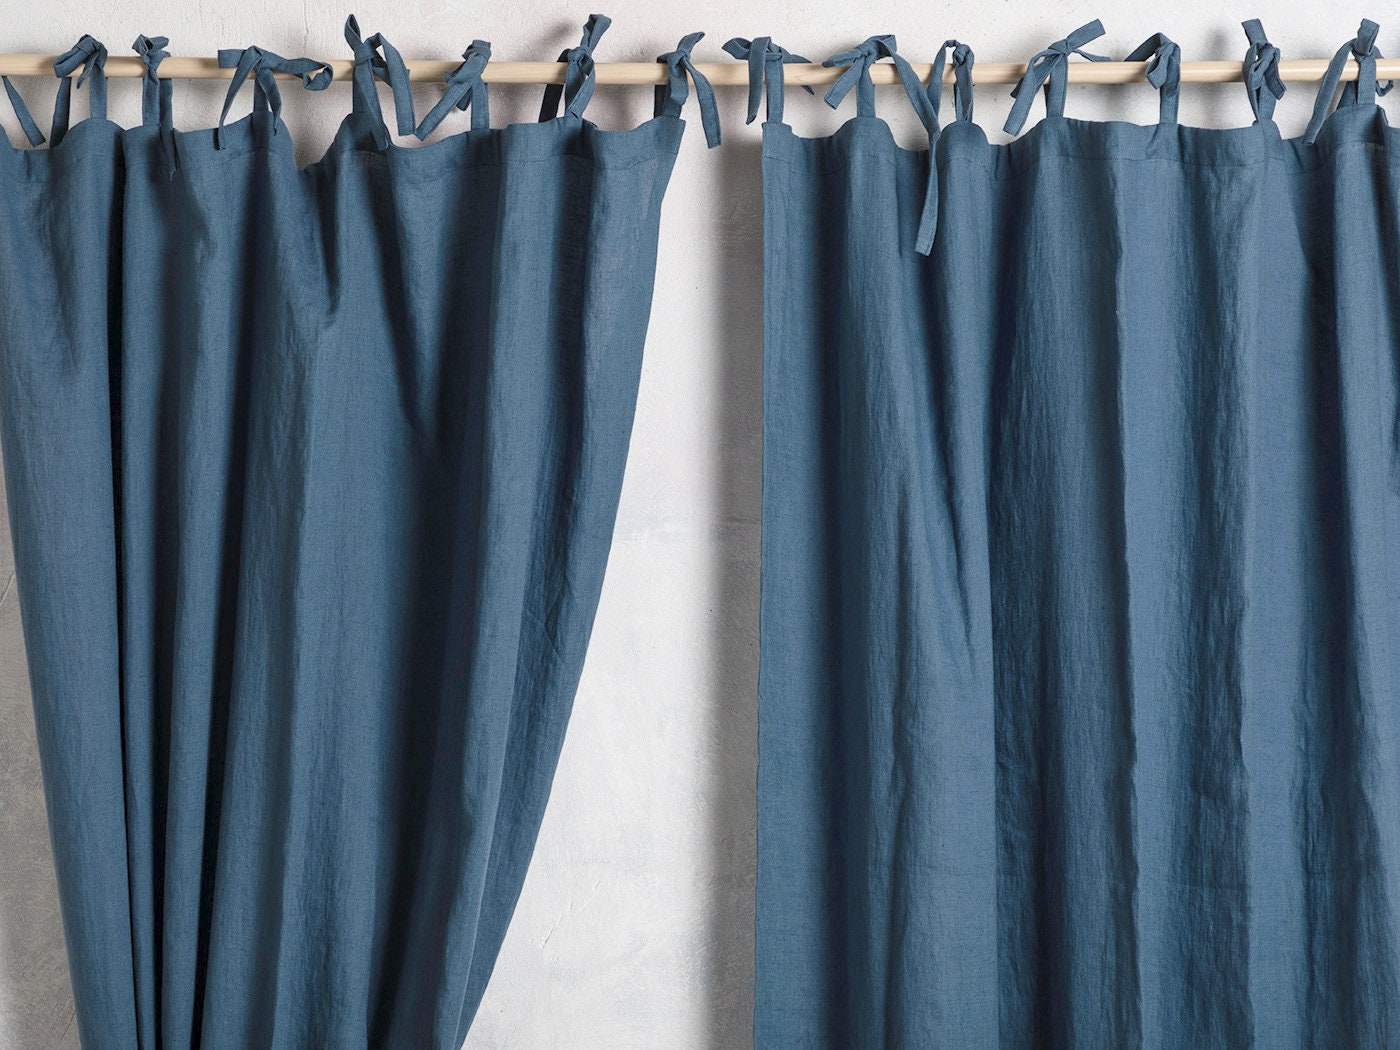 Linen Curtain Panel-Linen Curtain Drape In Blue Color